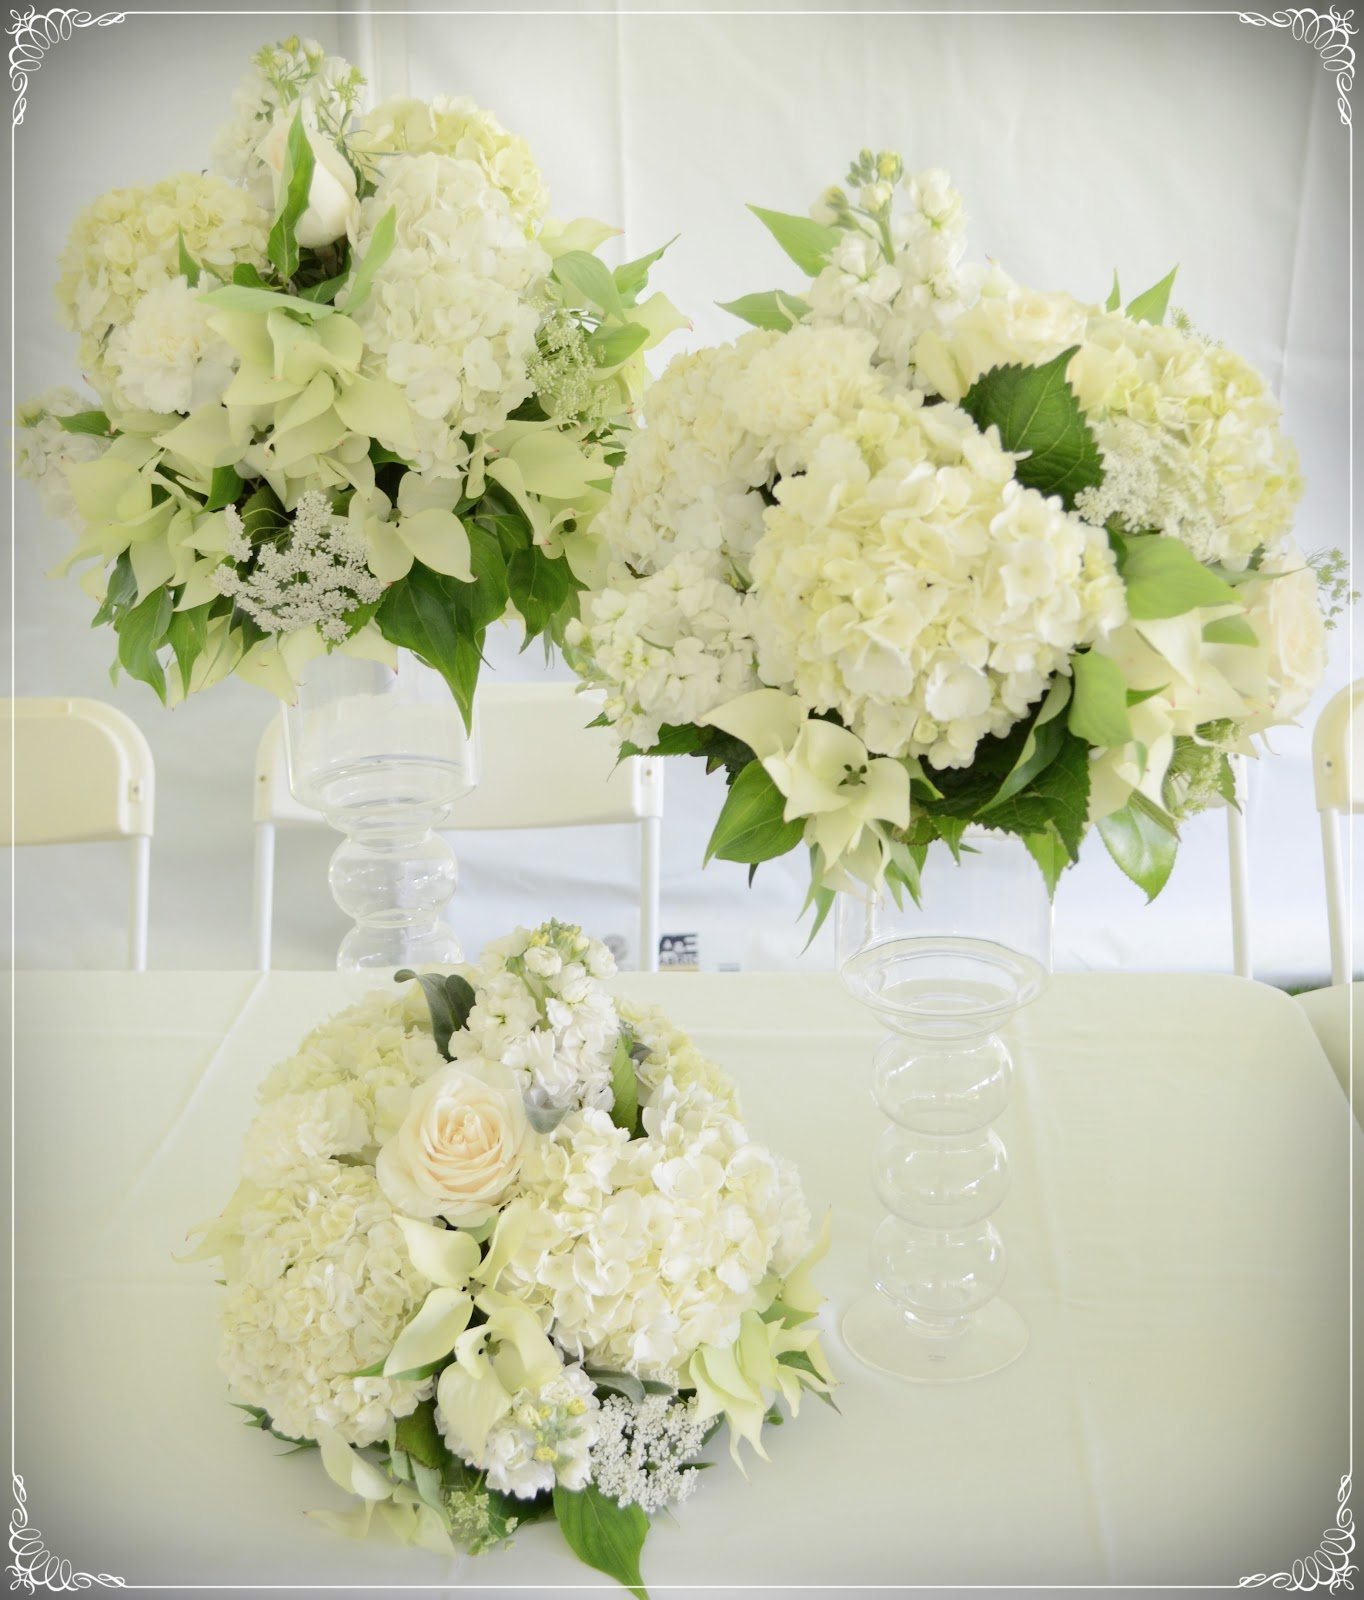 June Wedding Flowers: Flowers By JayLynn: Roundy/Gilmore Wedding June 15th, 2012